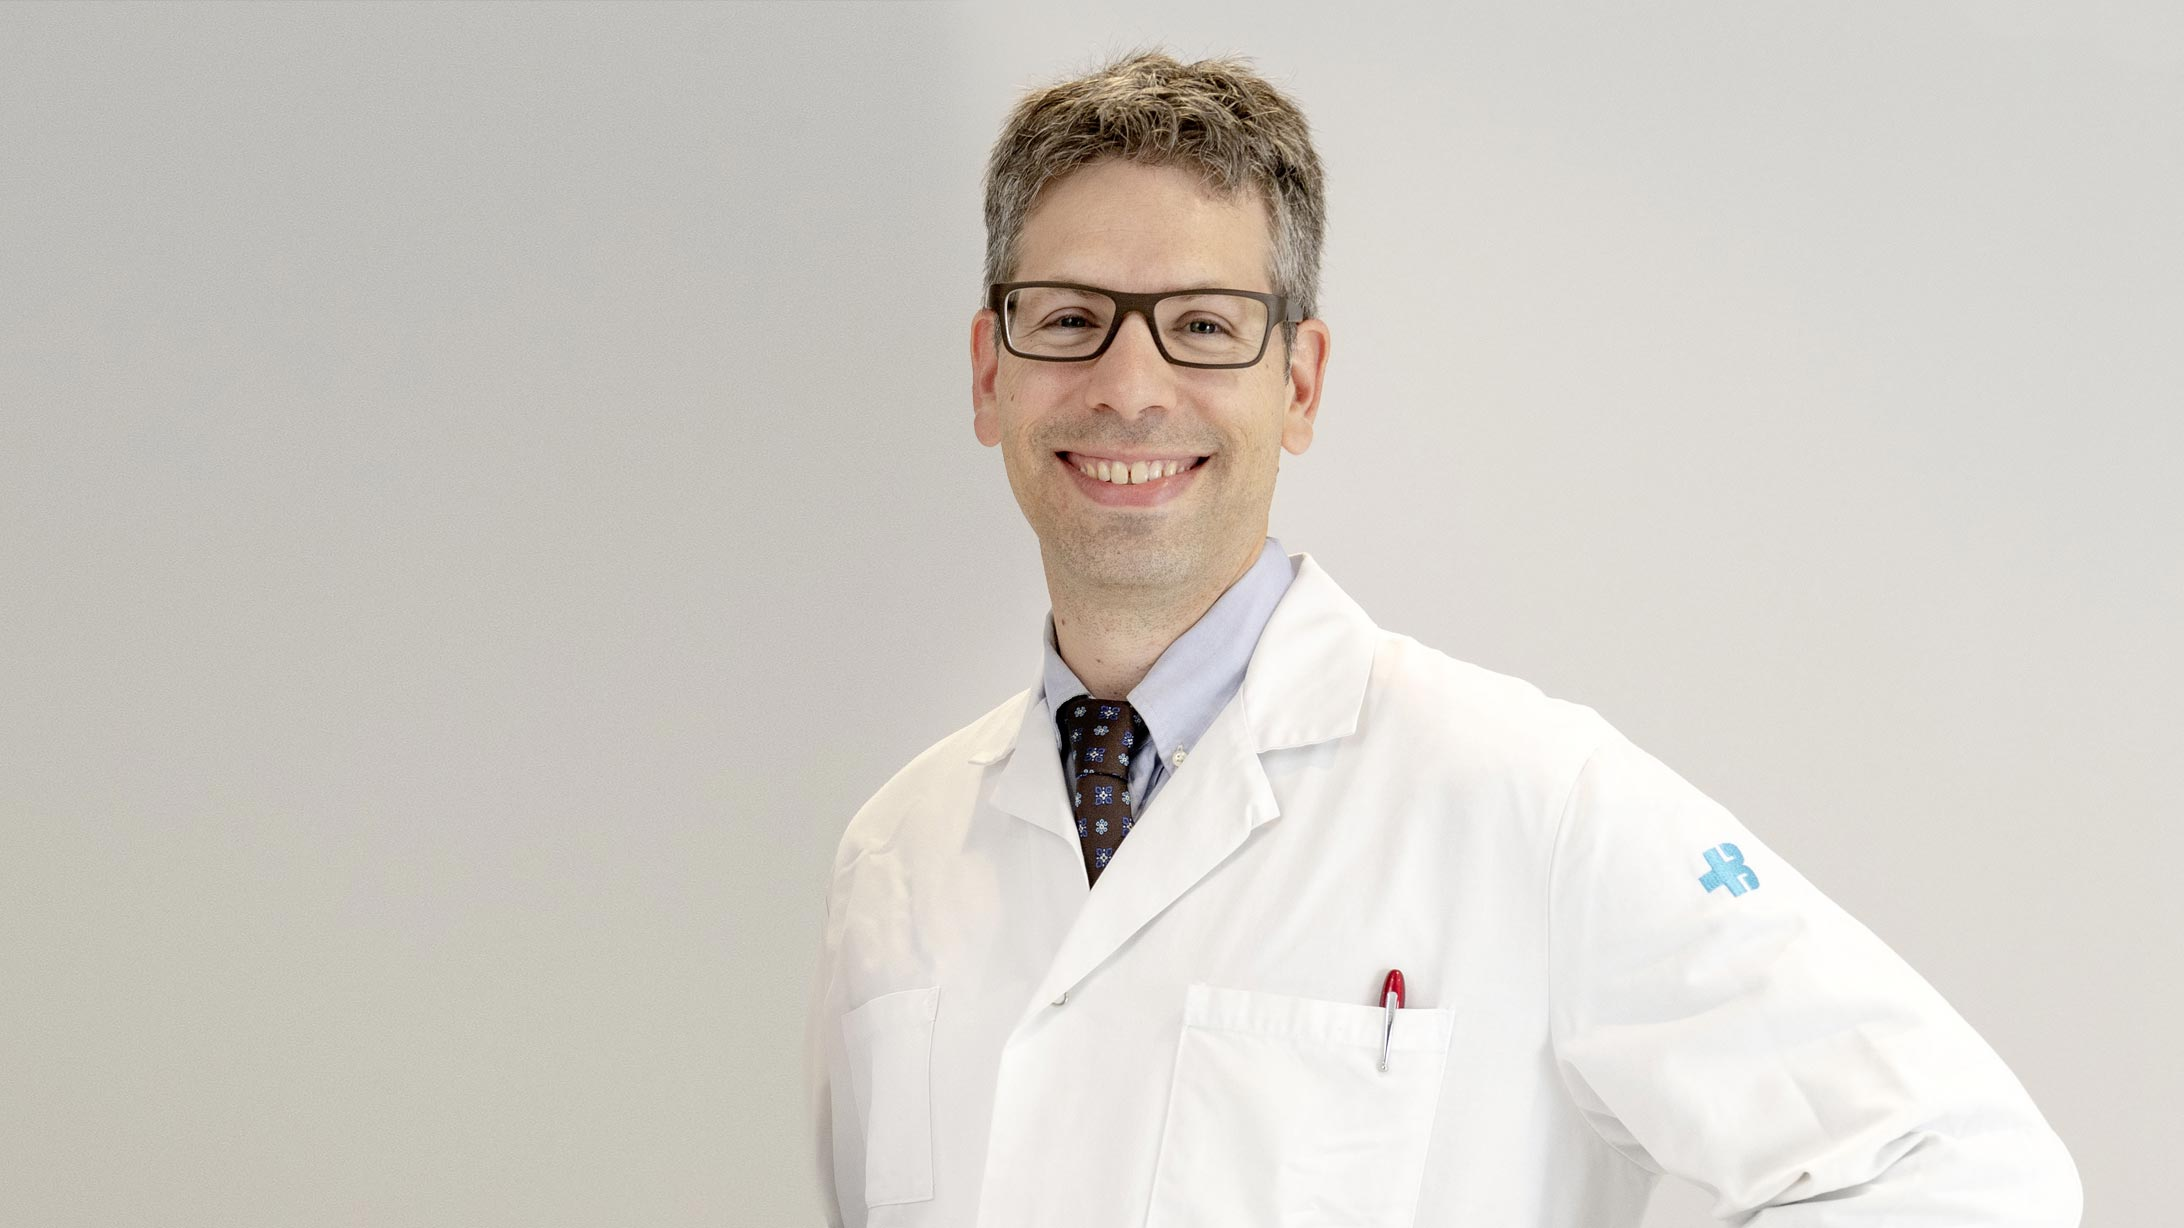 Alexander Tarnutzer, Leitender Arzt Neurologie am KSB